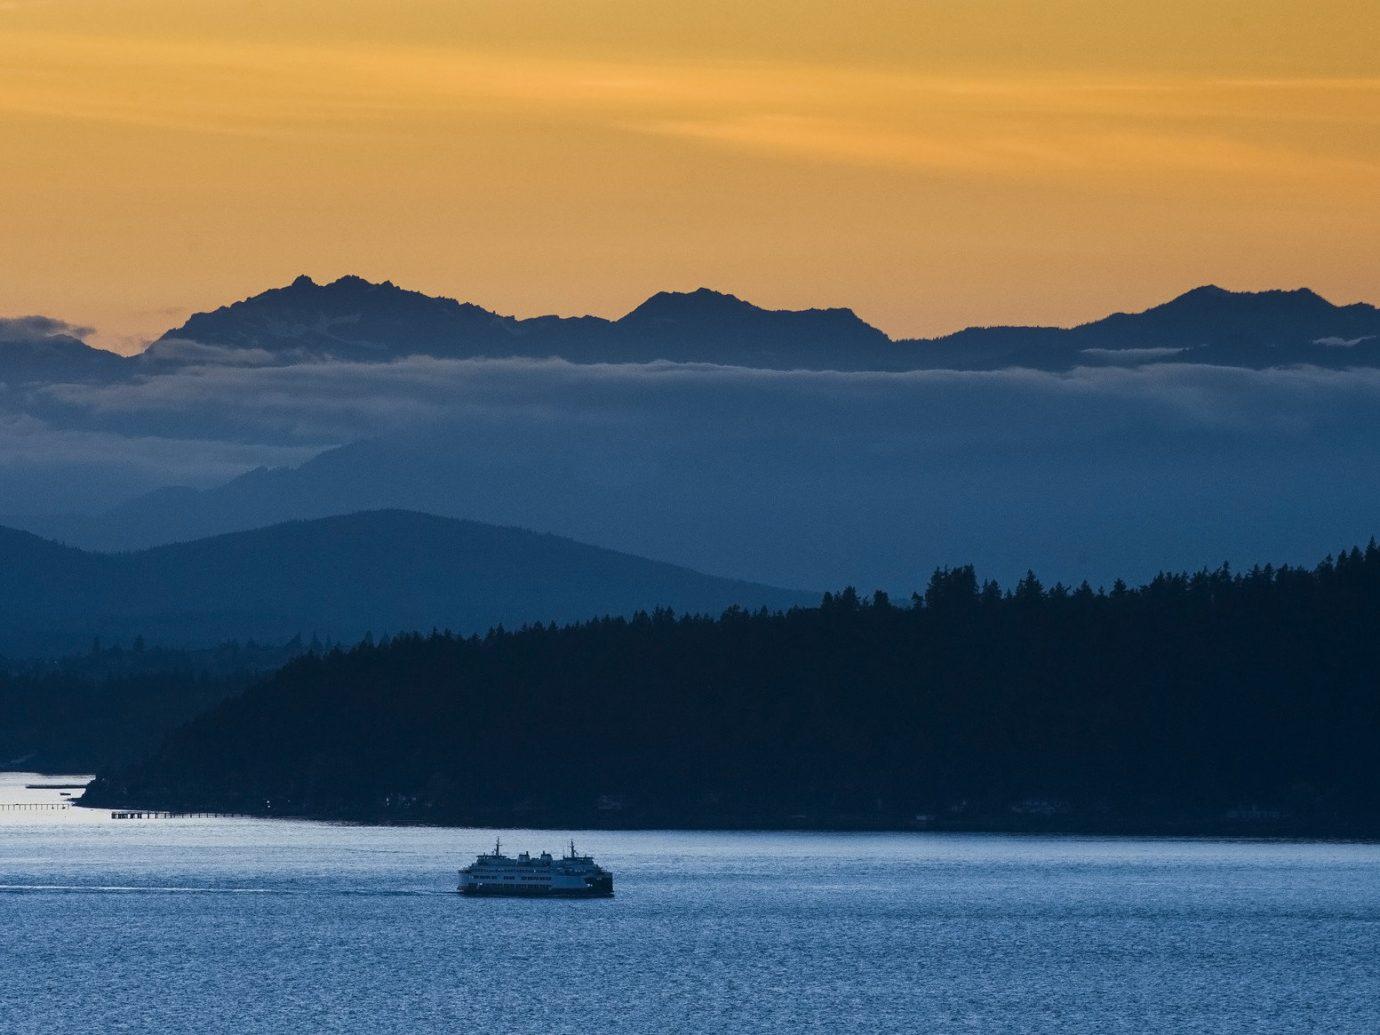 Mountains at sunset in Seattle, WA